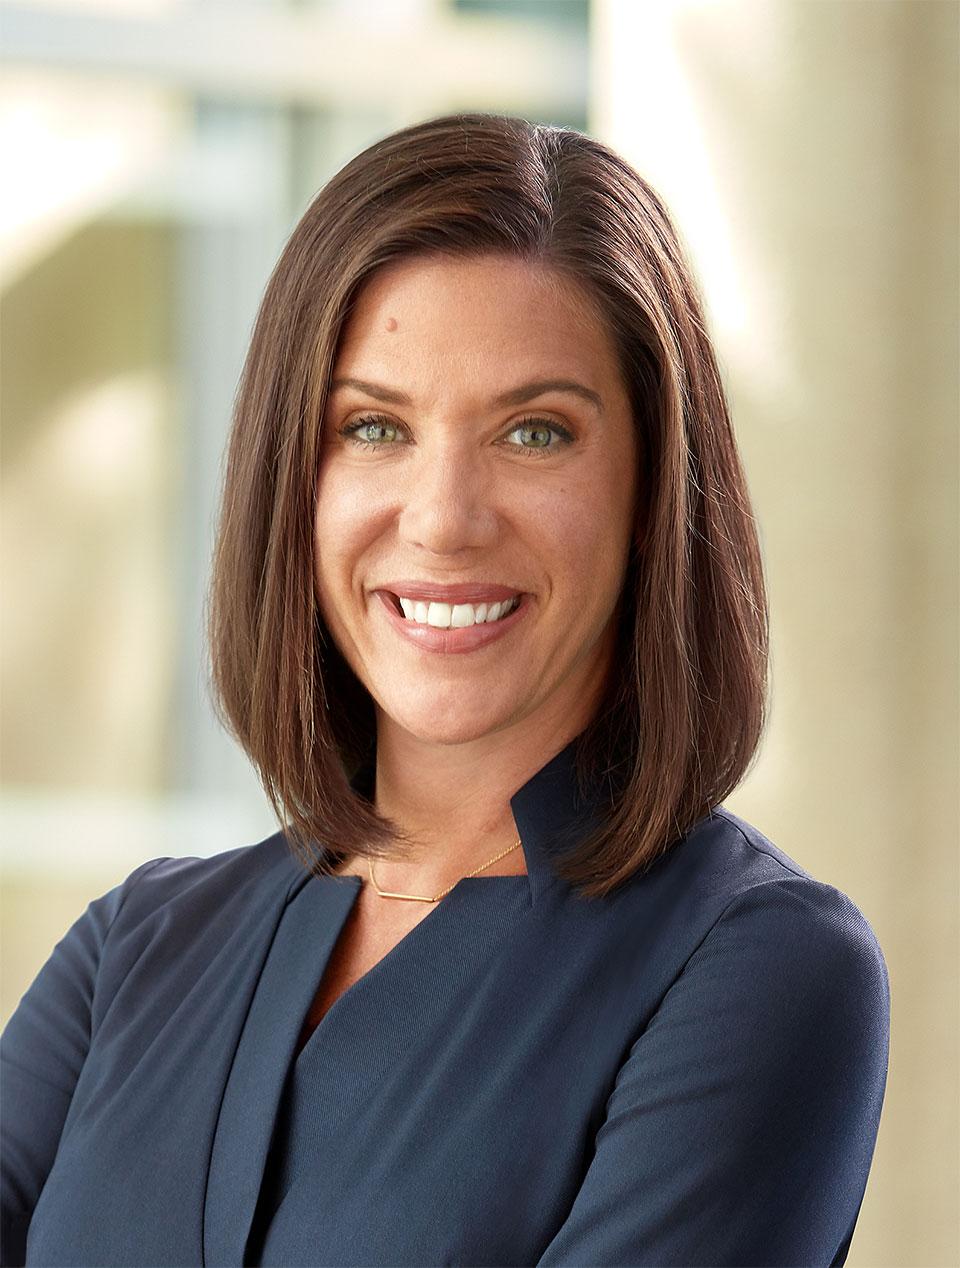 Corie Barry CEO of Best Buy